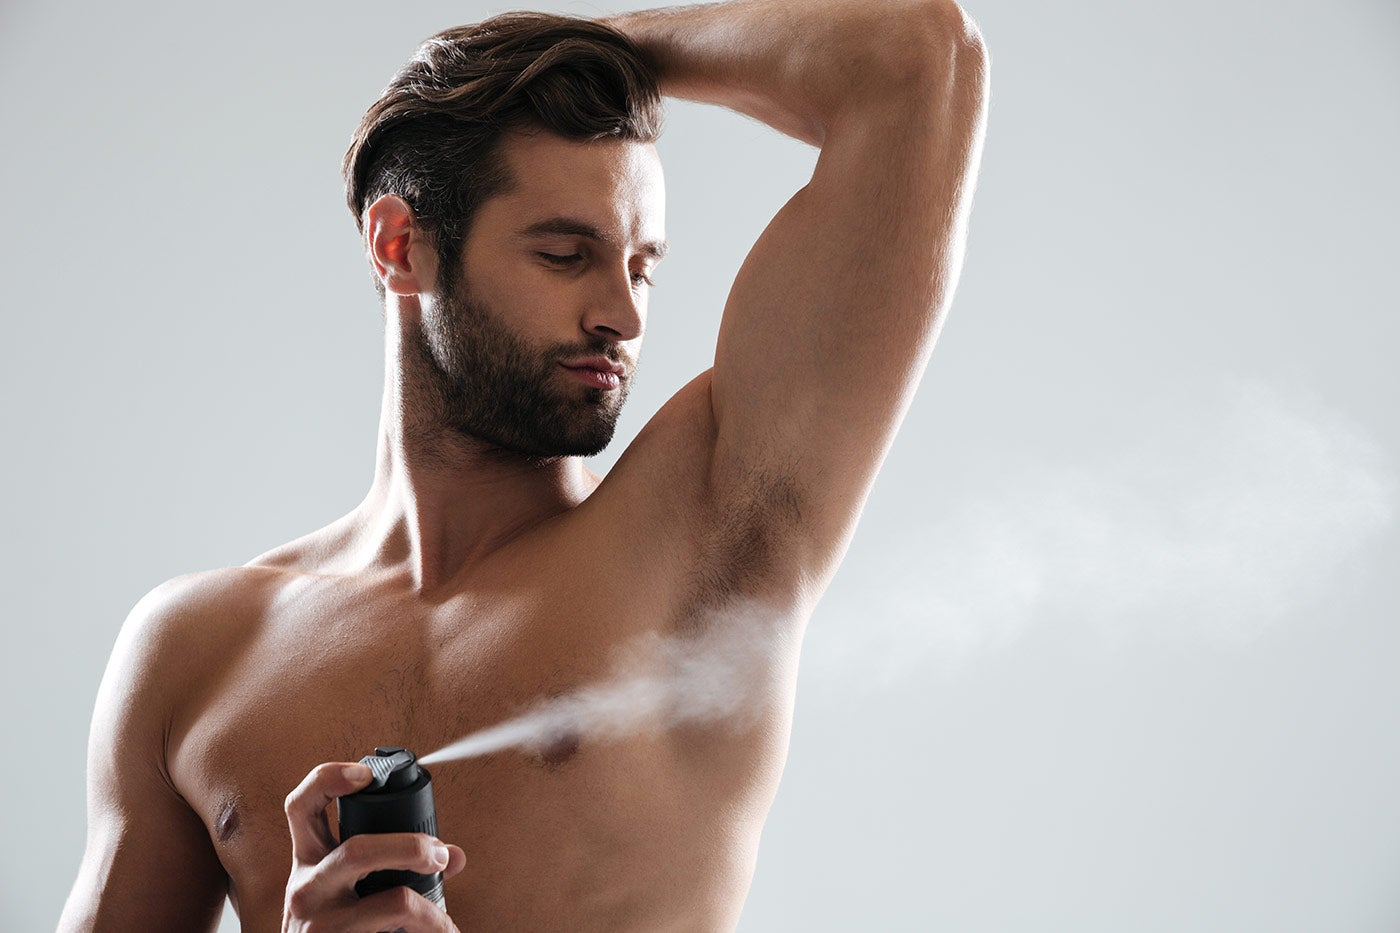 The Top Ten Deodorants According to the Men of Reddit - SWAGGER Magazine